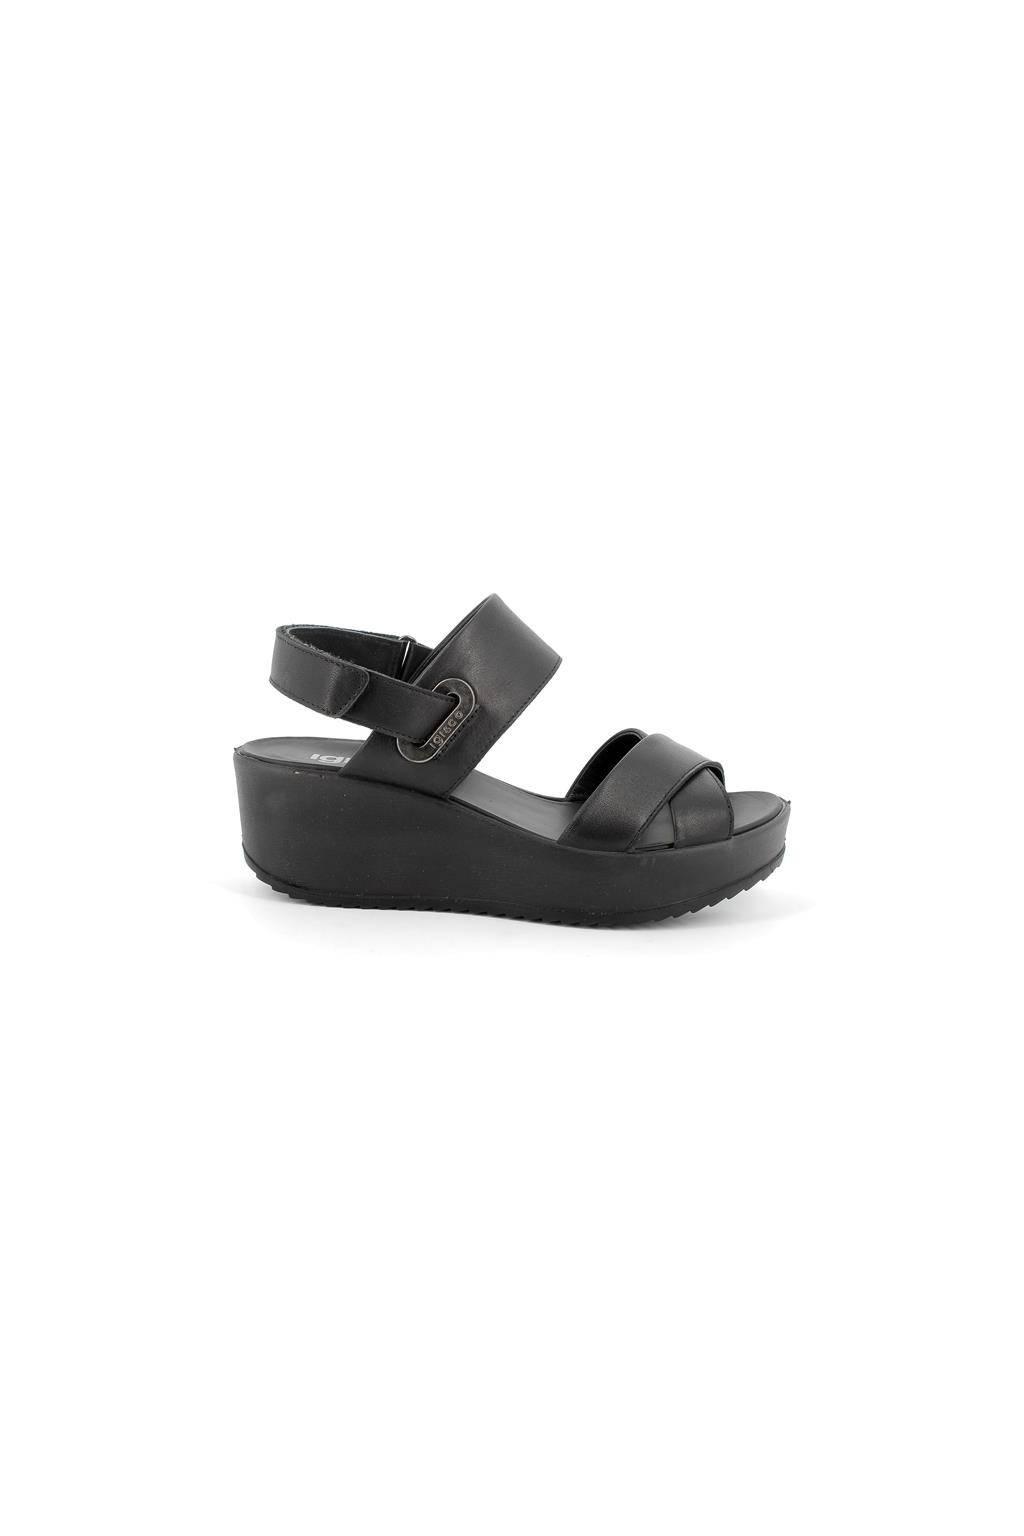 Sandalia Igi&Co  5178300 nero